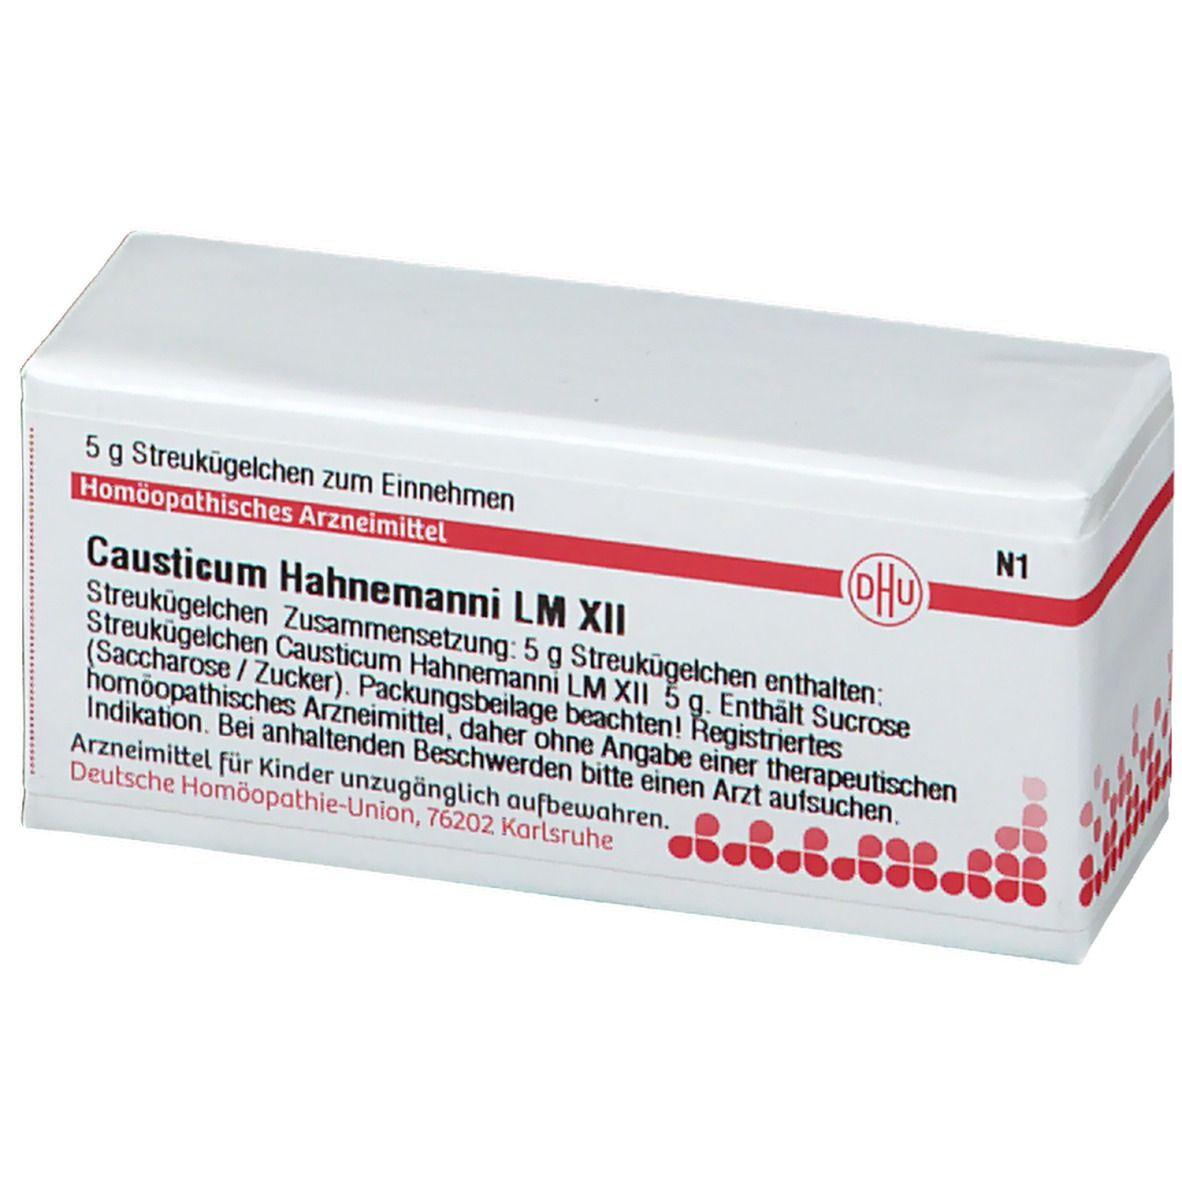 DHU Causticum Hahnemanni LM XII